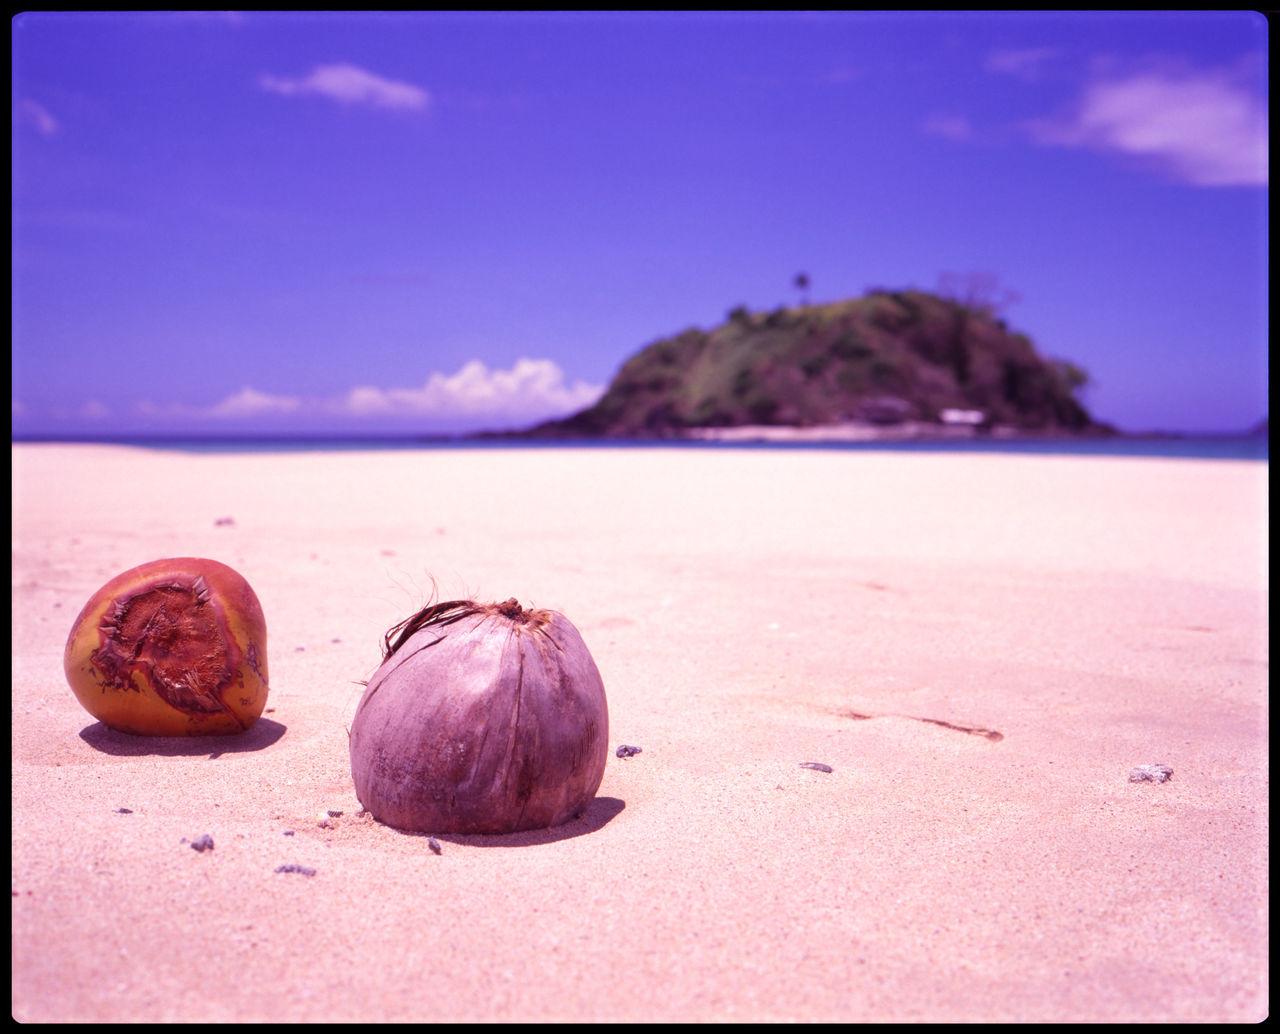 The life of a coconut Analogue Photography ASIA Beach And Sky Beach Life Blue Sky Coconut Coonut On Beach Dream Beach Dream Island El Nido Medium Format Nacpan Palawan Palm Beach Palms Philippines Plants On Beach Secret Escape Sky And Palms Slide Travel White Beach